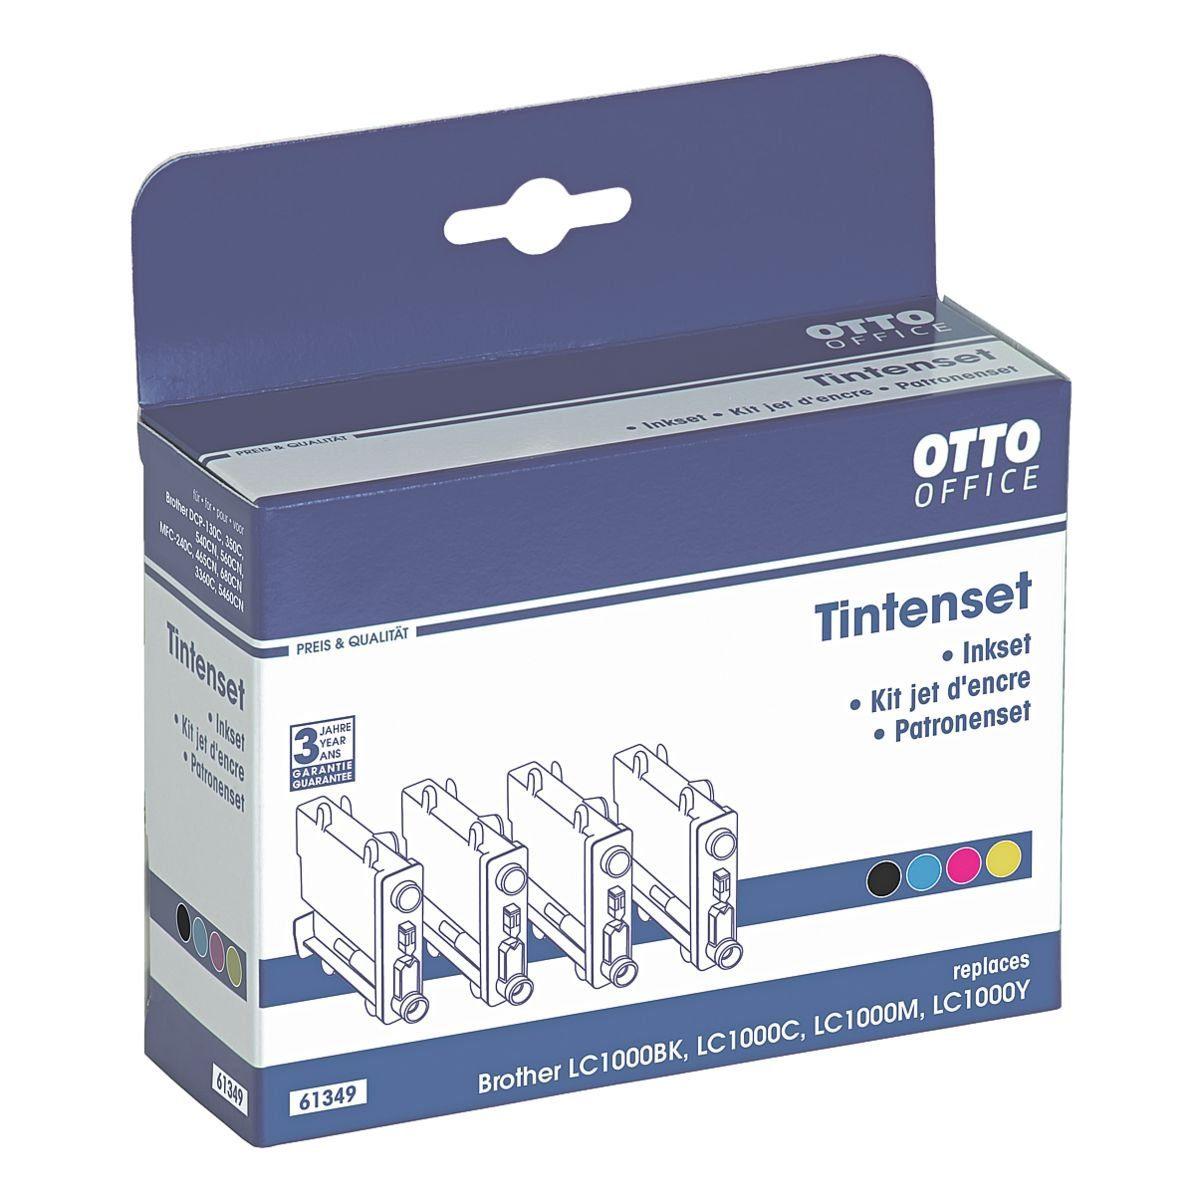 OTTO Office Standard Tintenpatronen-Set ersetzt Brother »LC1000«